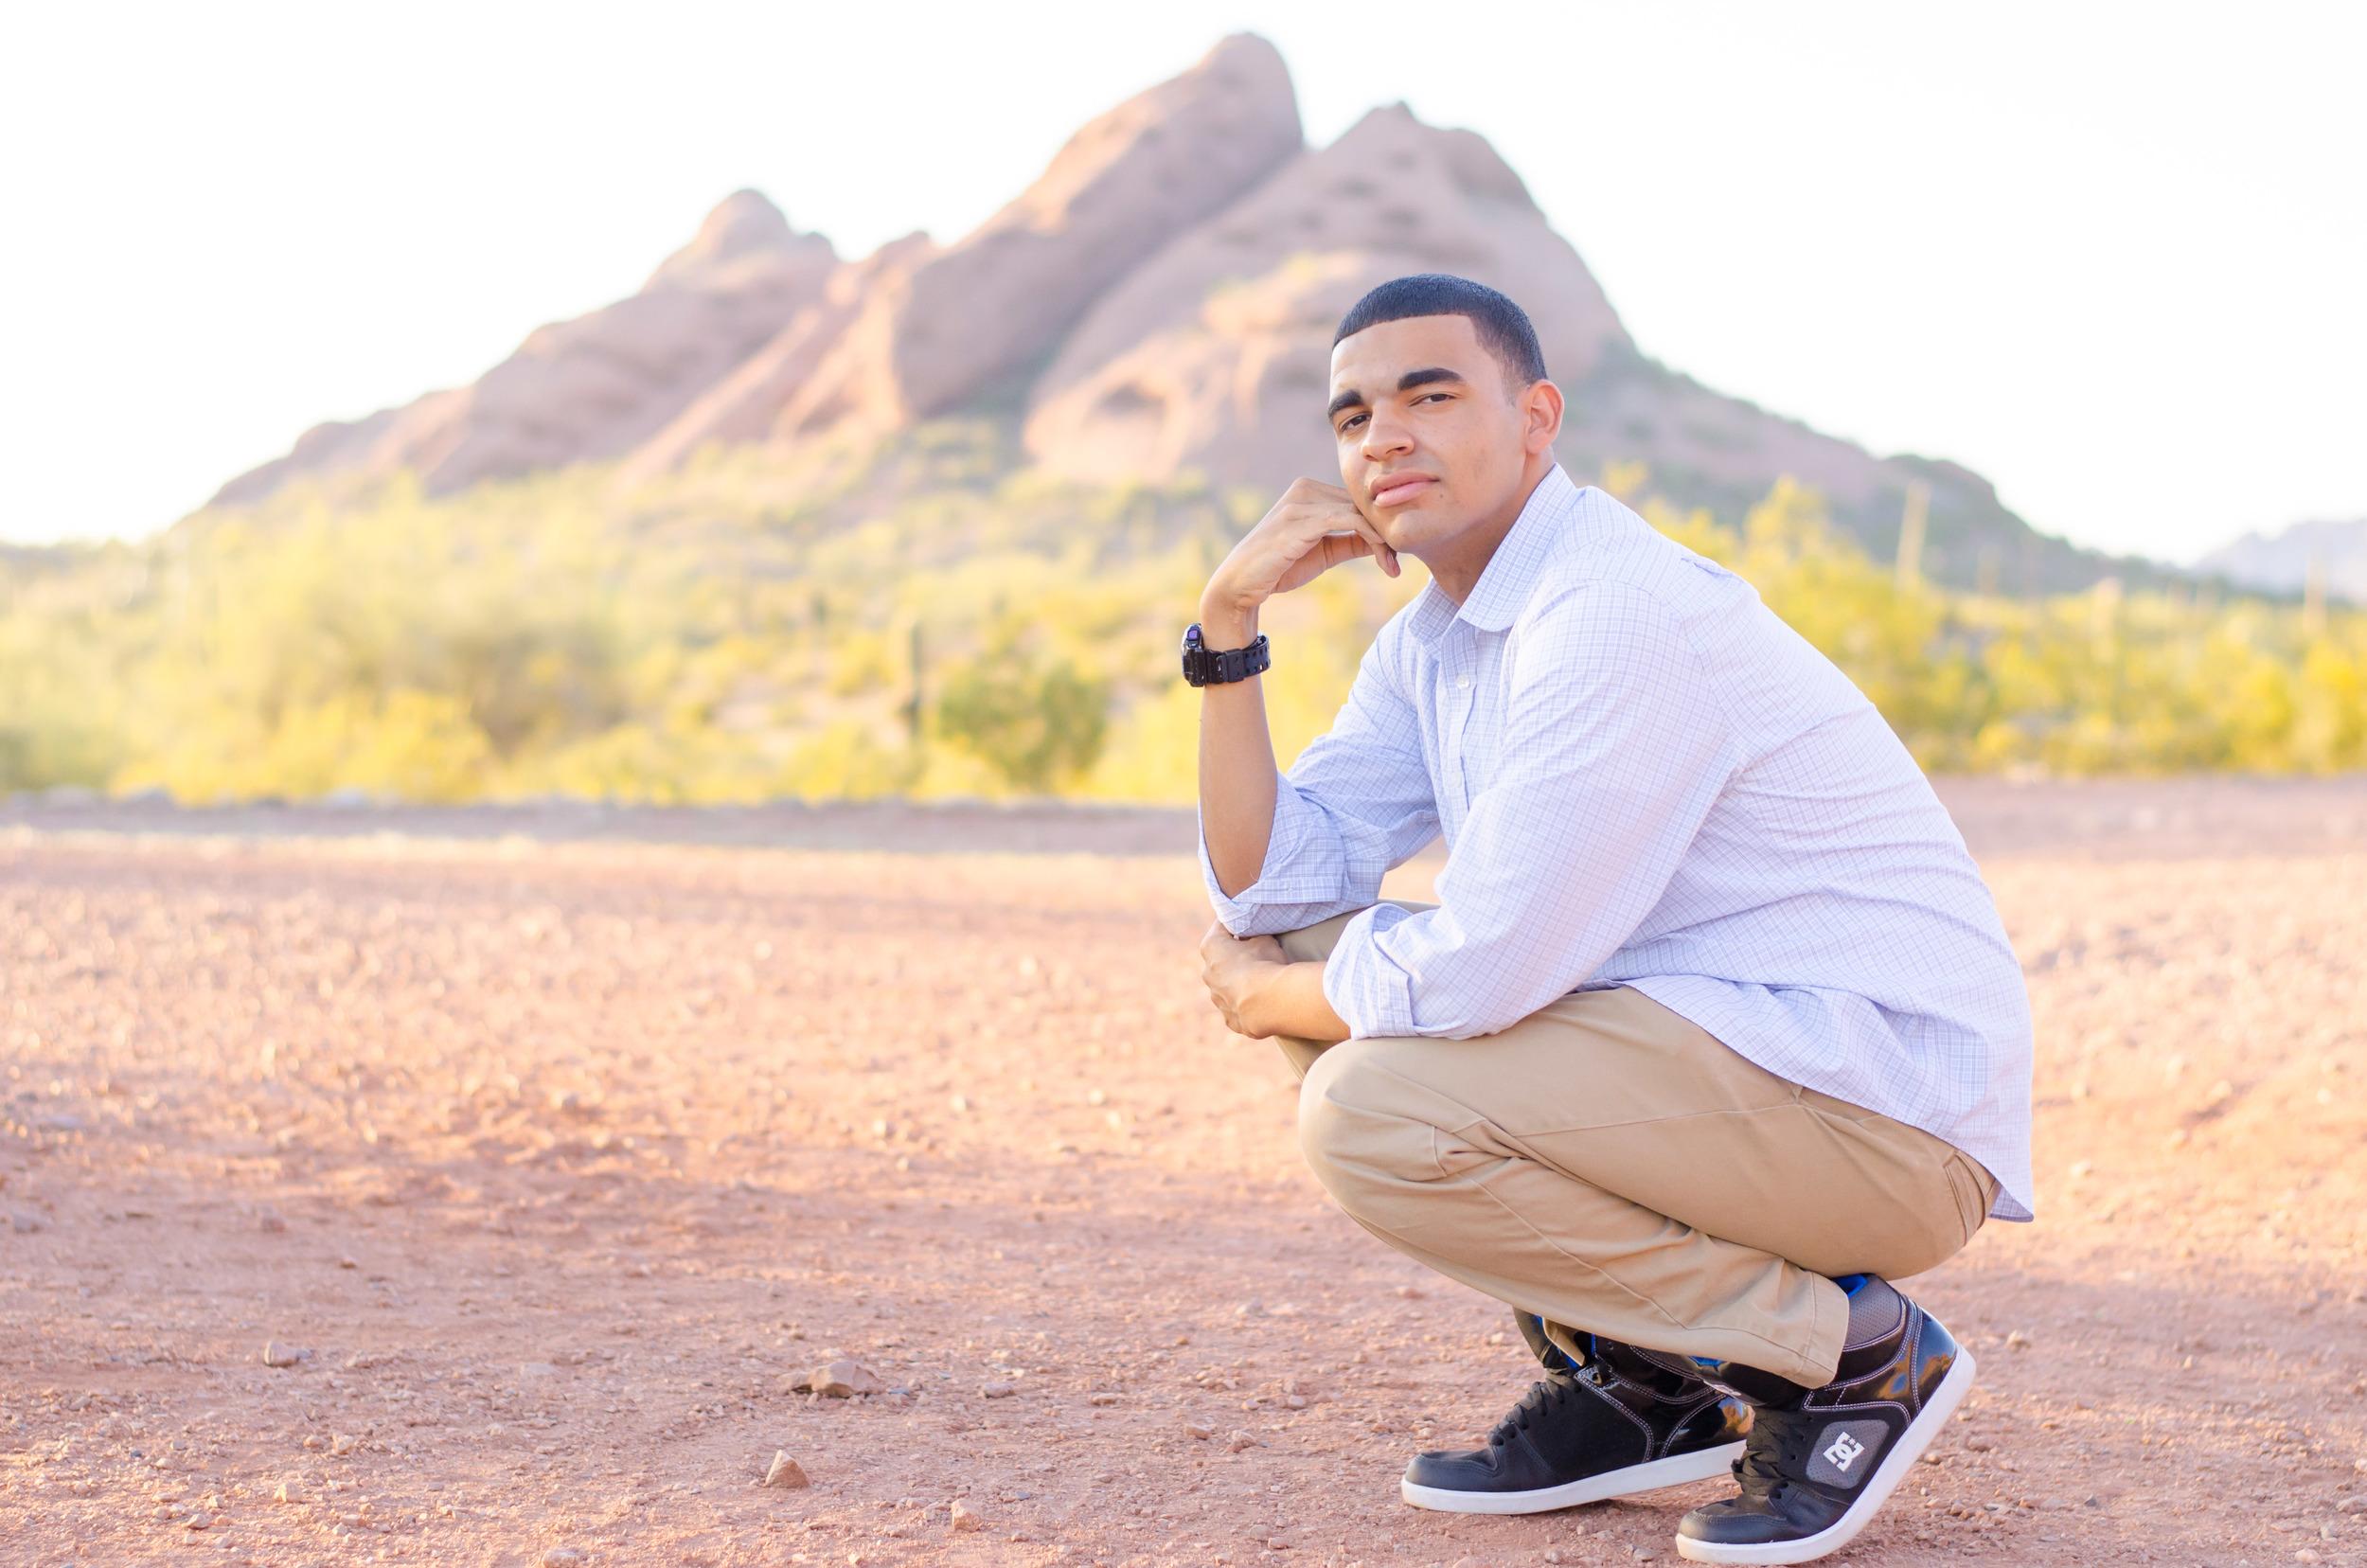 glendale arizona family photographer -04922015.jpg